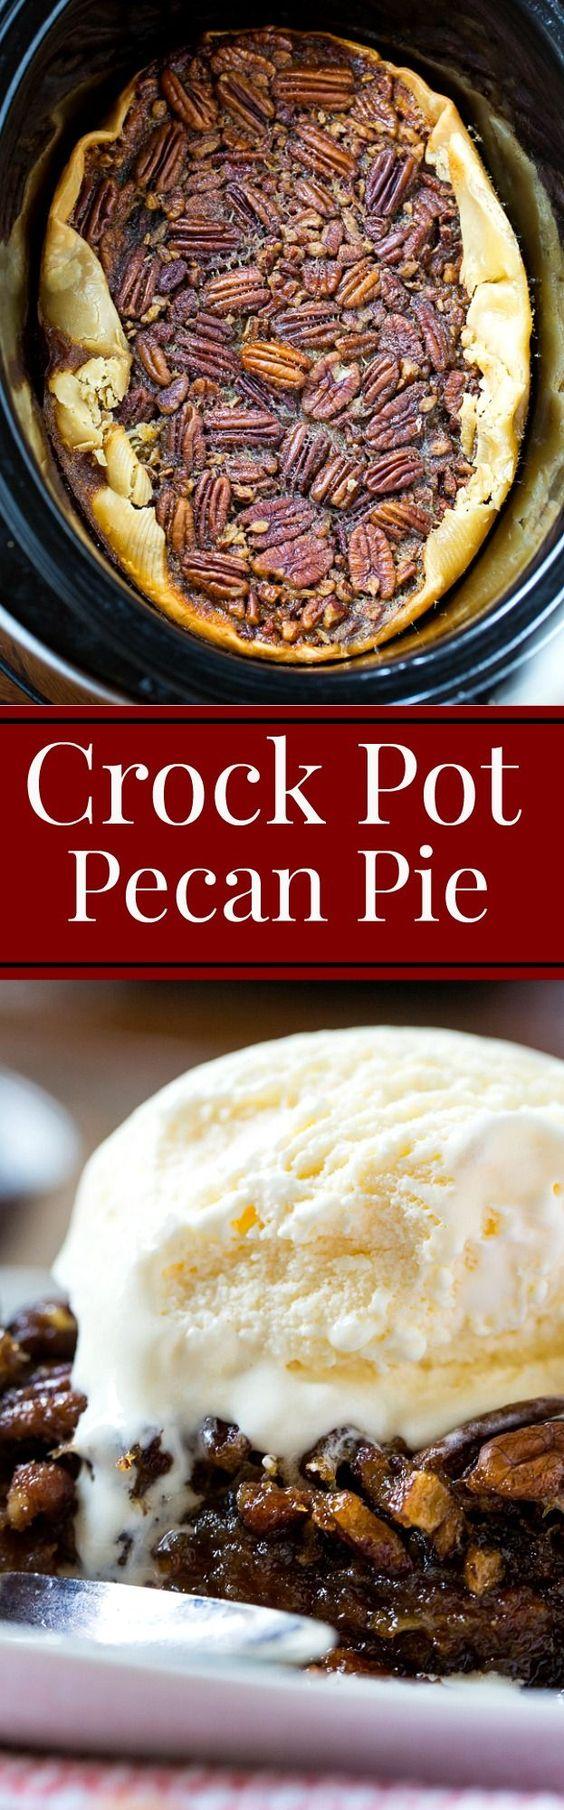 Crock pot pecan pie recipe thanksgiving pecan pies for Crock pot thanksgiving dessert recipes